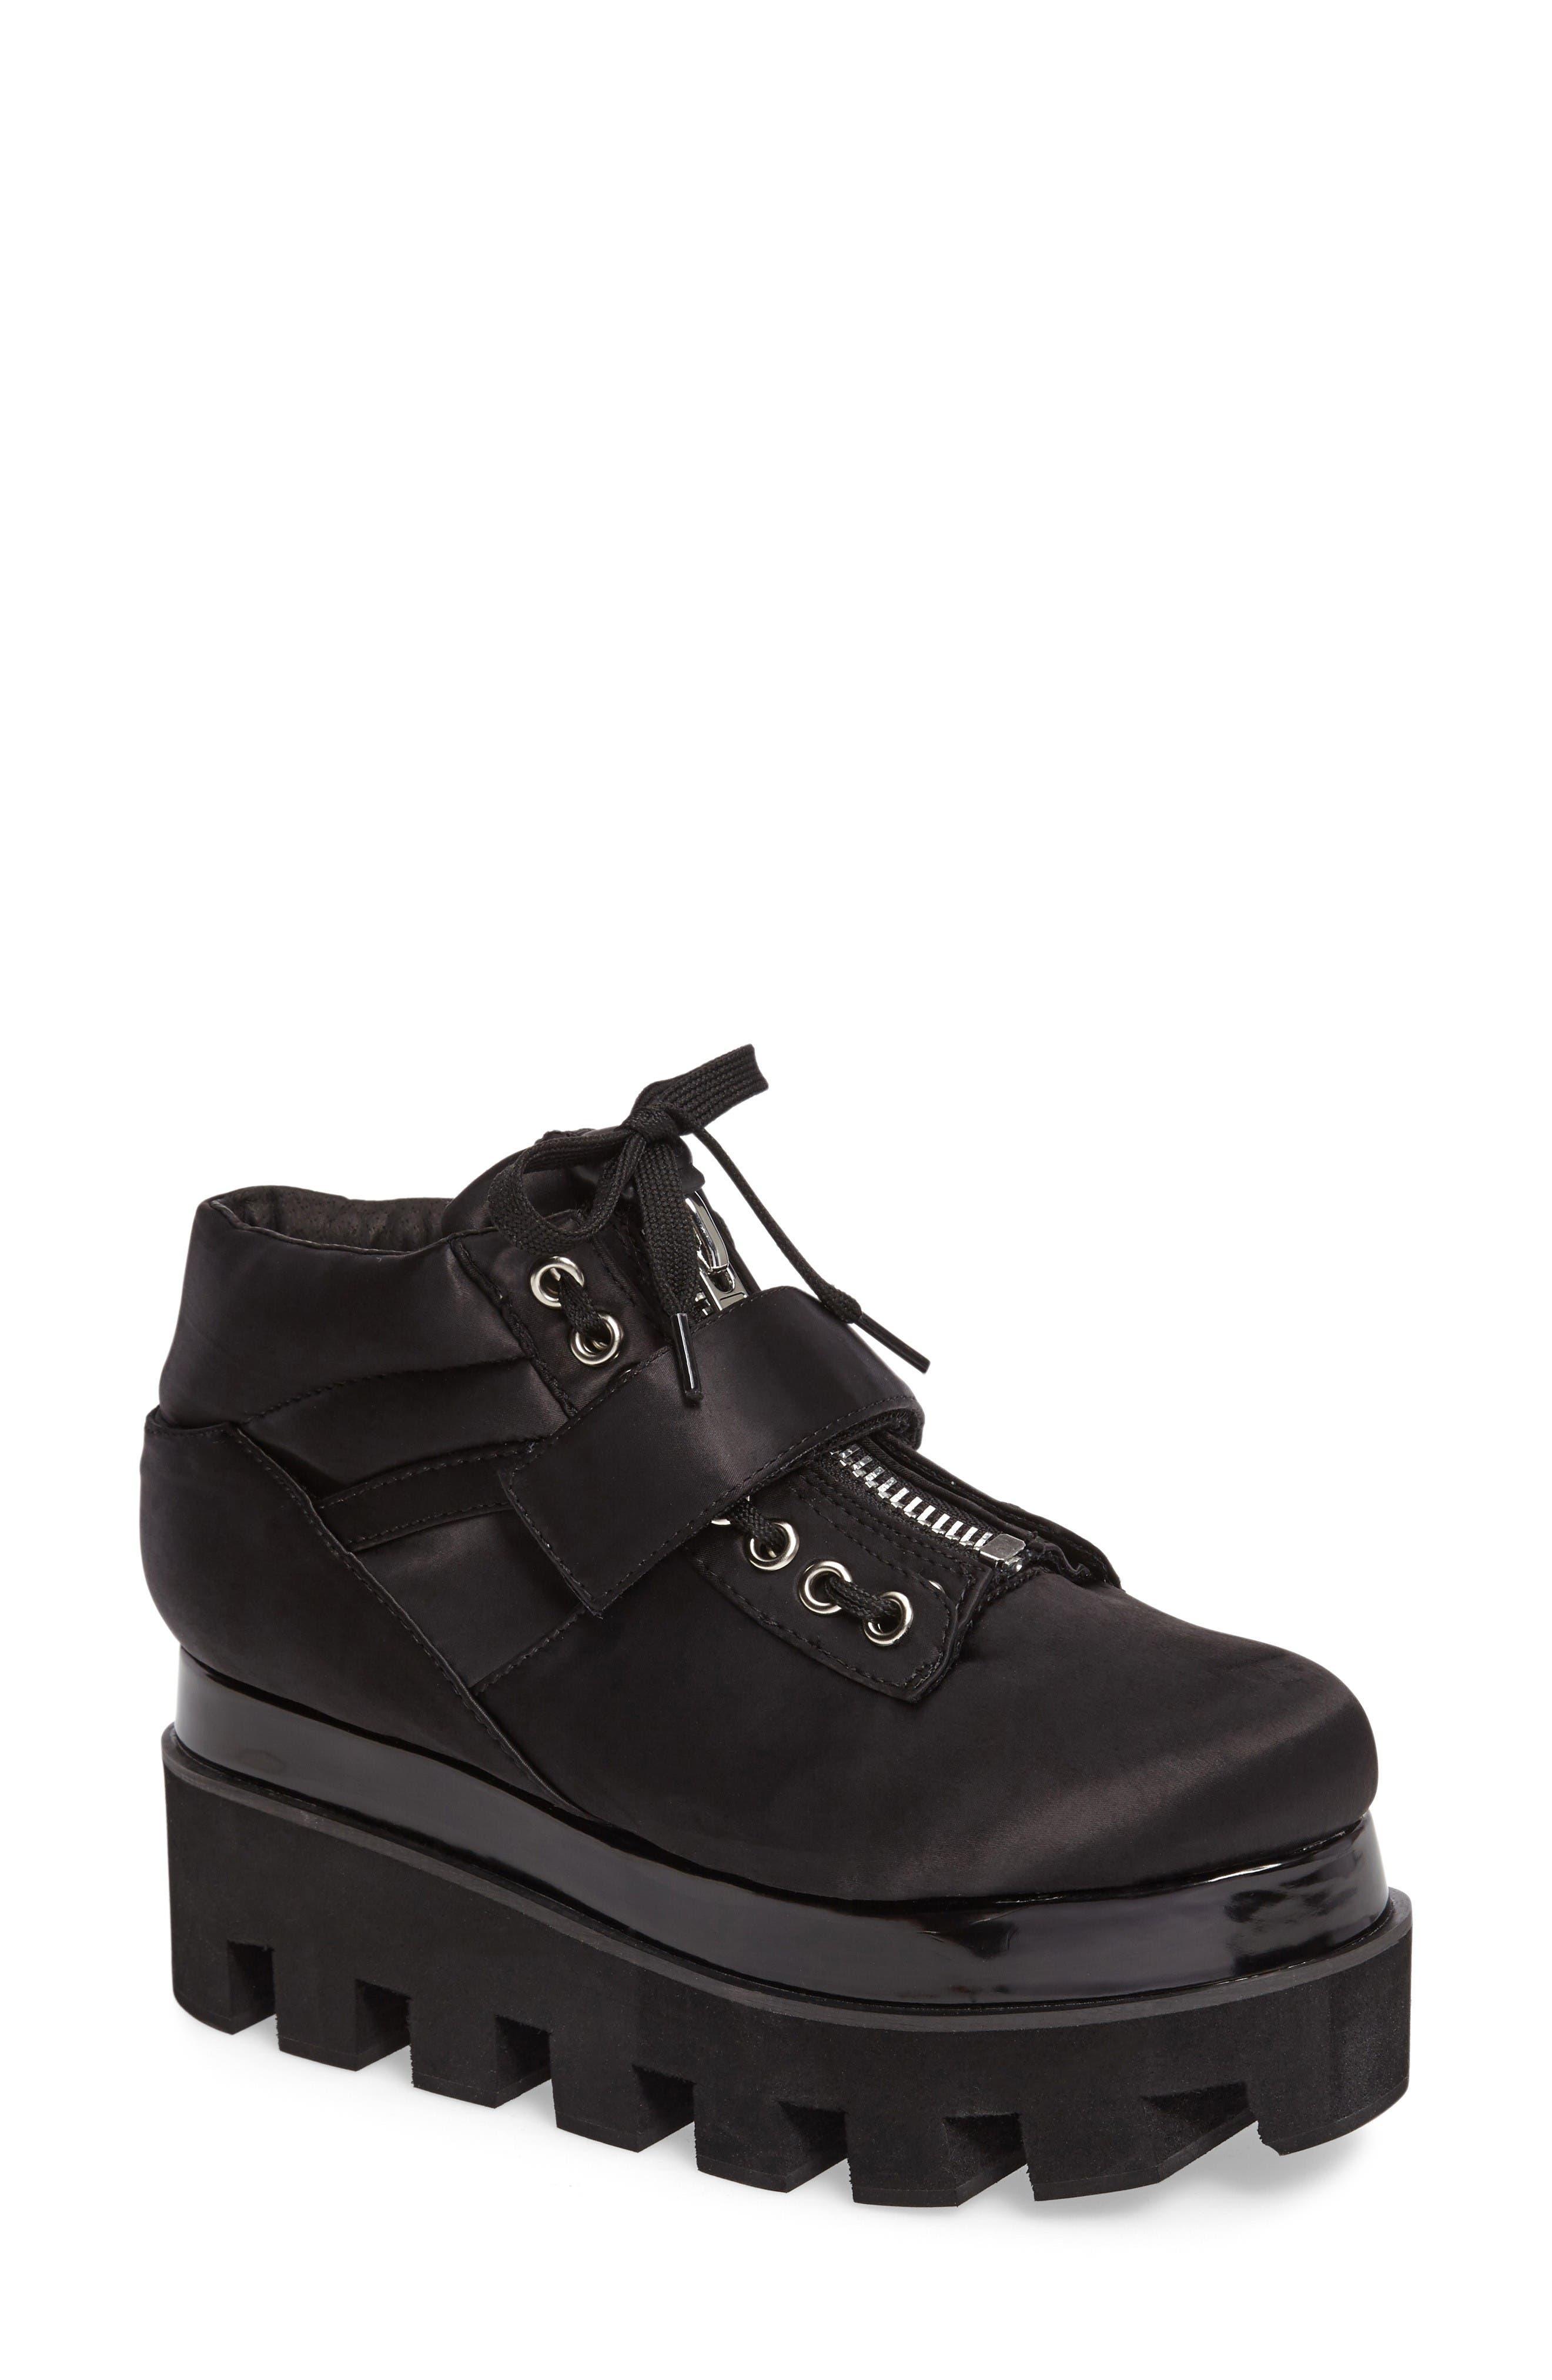 Alternate Image 1 Selected - Jeffrey Campbell Extrema Platform Sneaker (Women)